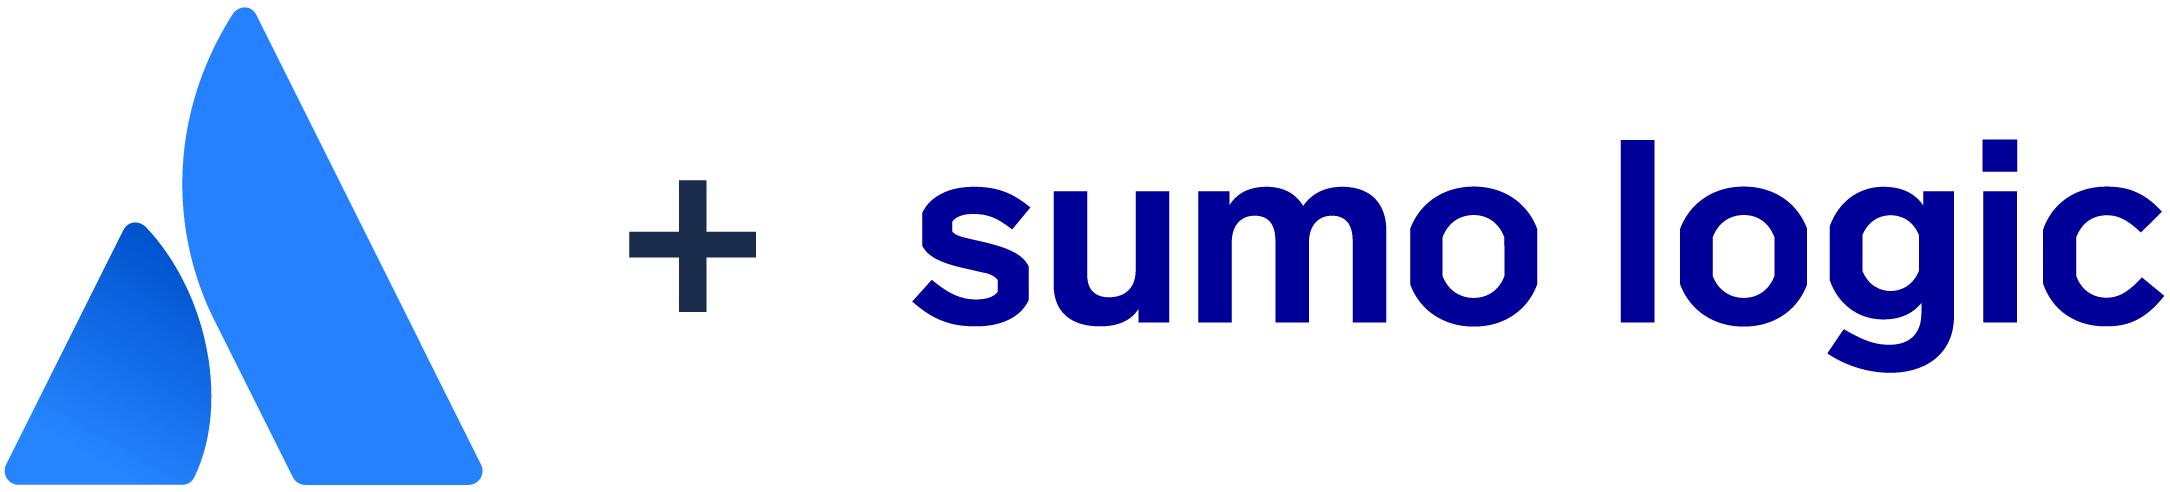 Atlassian-Logo + Sumo Logic-Logo